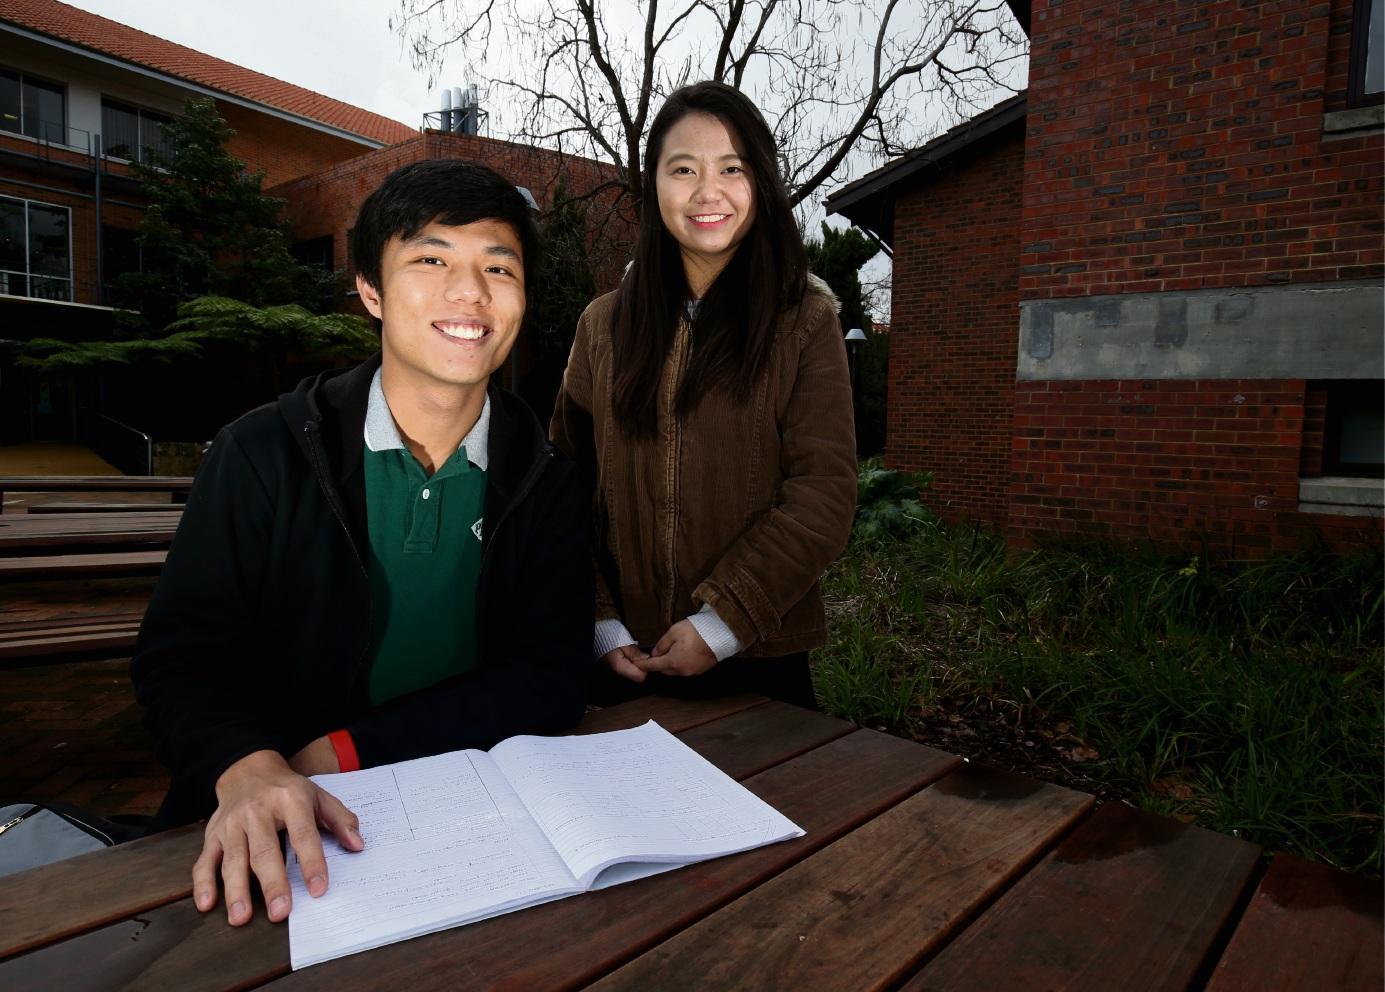 Curtin University students Joshua Wong and Michelle Lau.